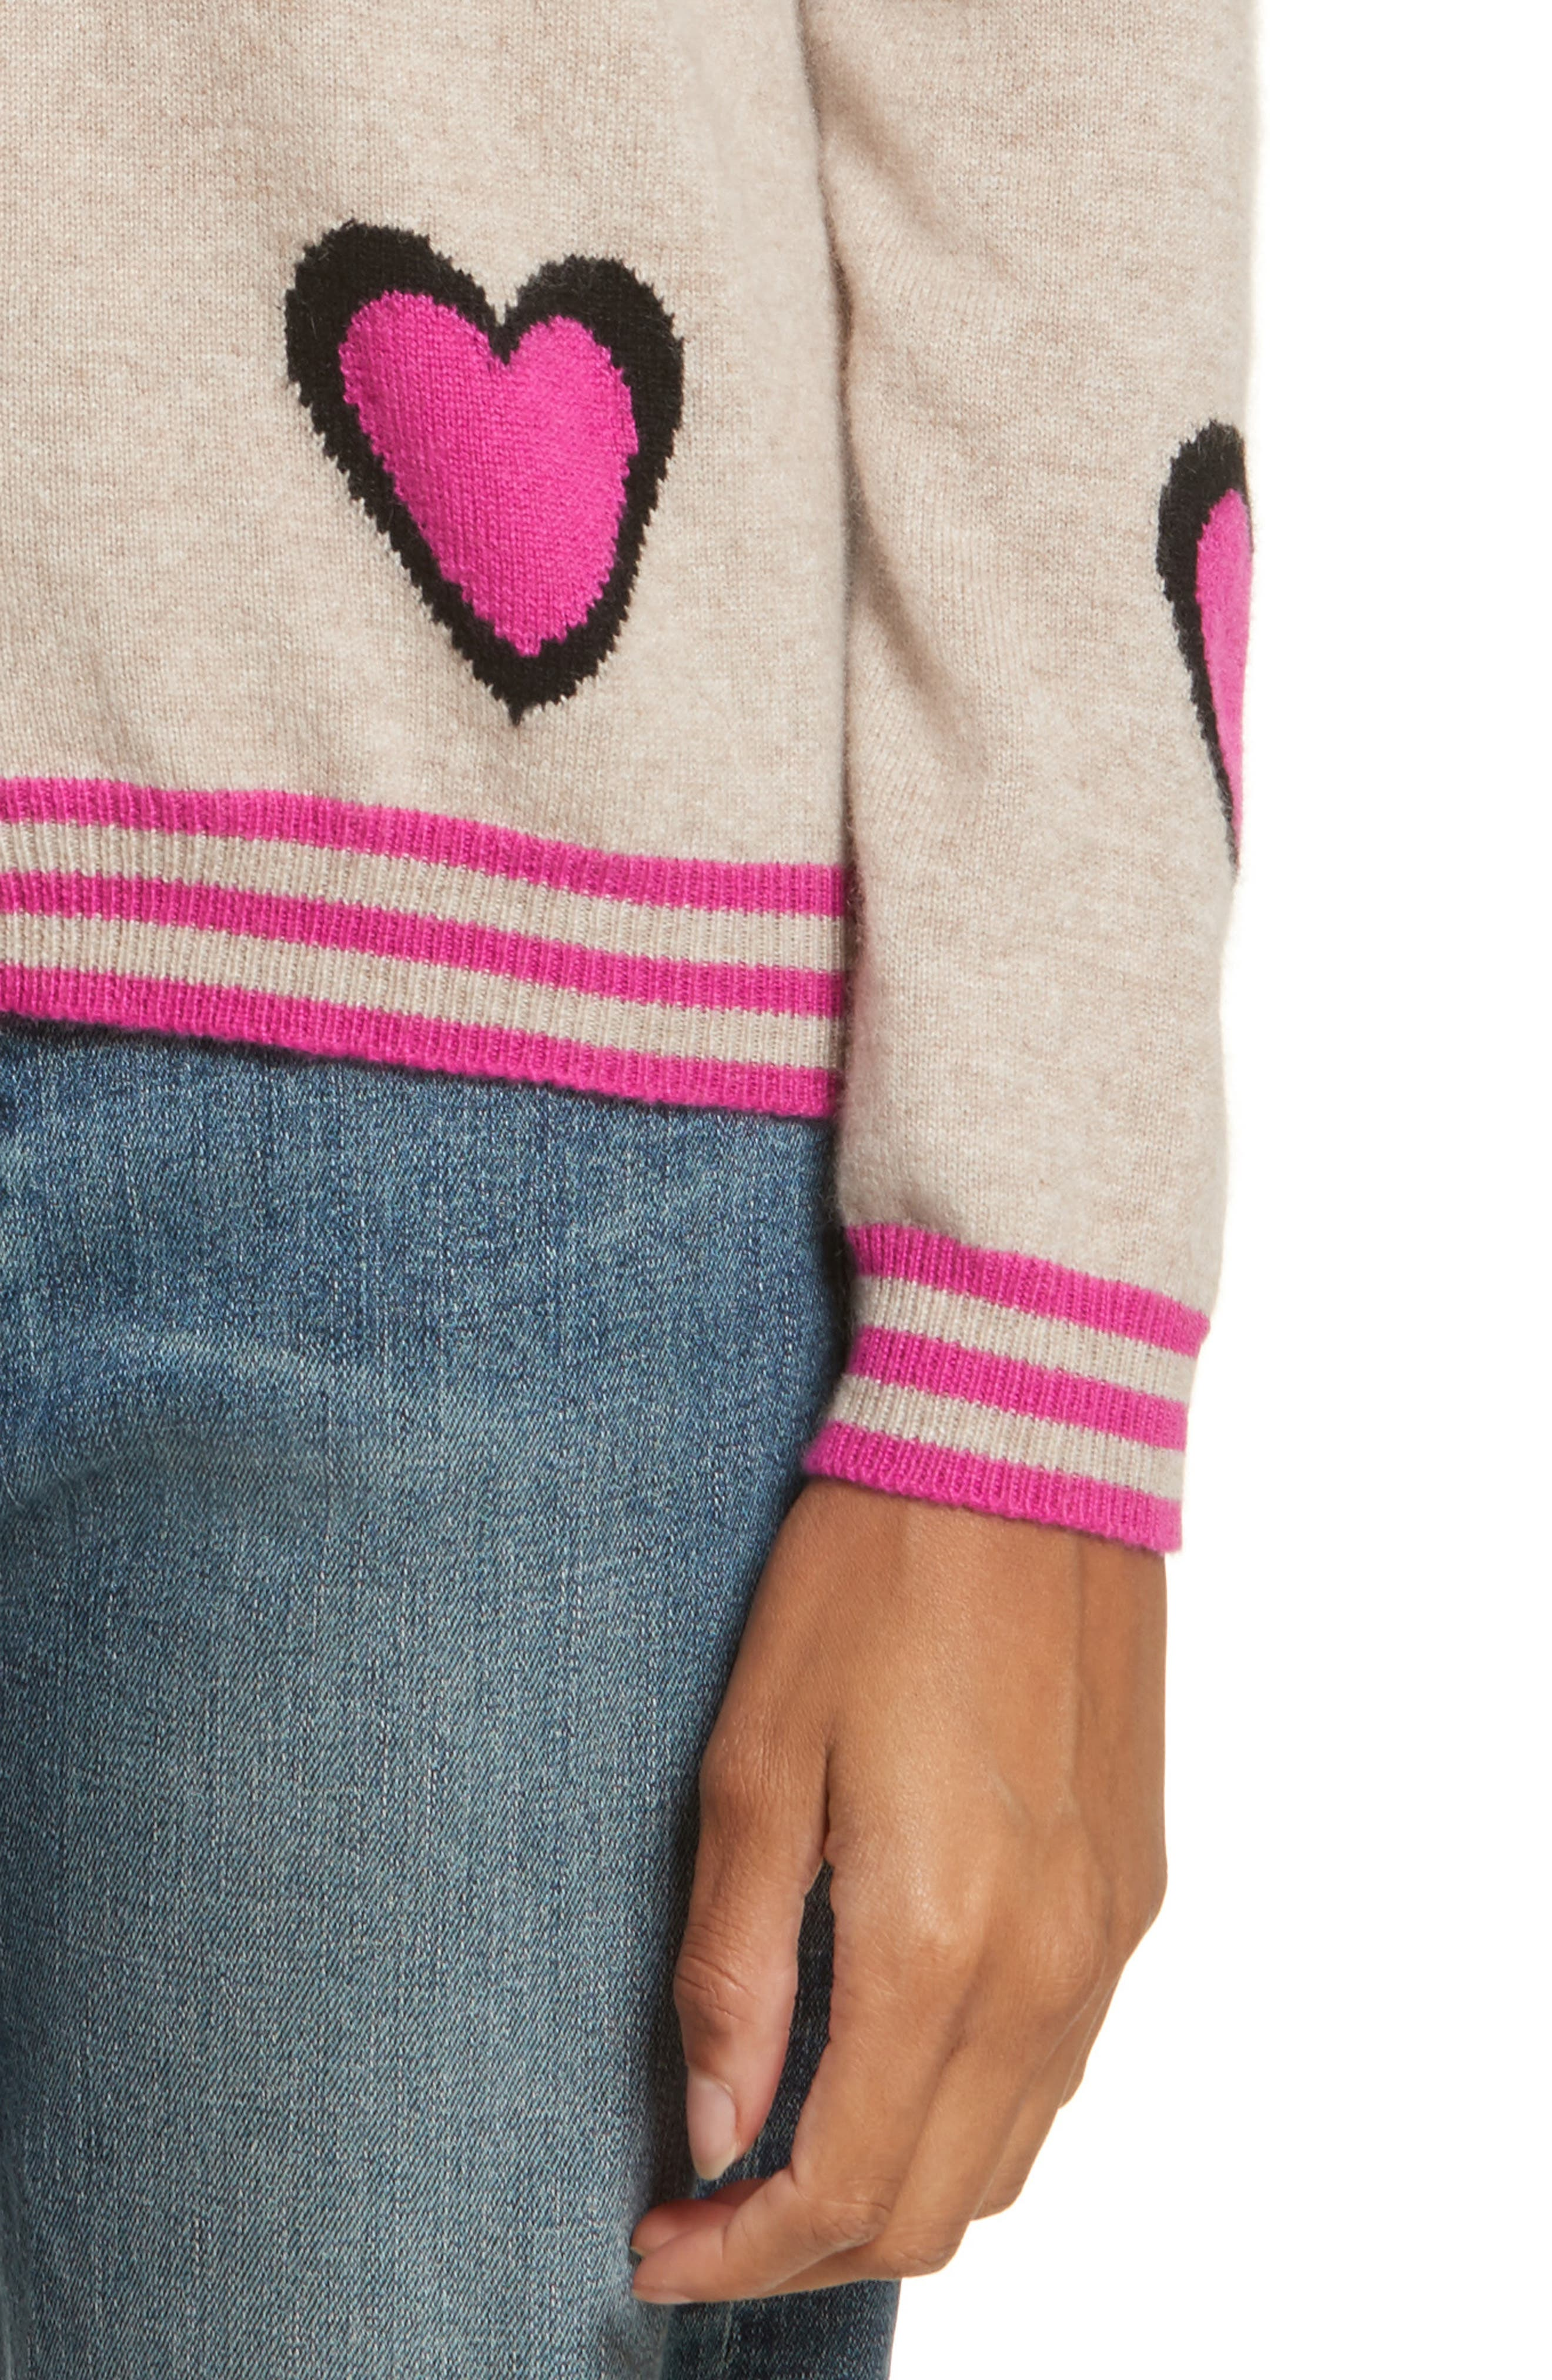 CHINTI & PARKER Heart Burst Cashmere Sweater,                             Alternate thumbnail 4, color,                             Oatmeal/ Black/ Fuchsia